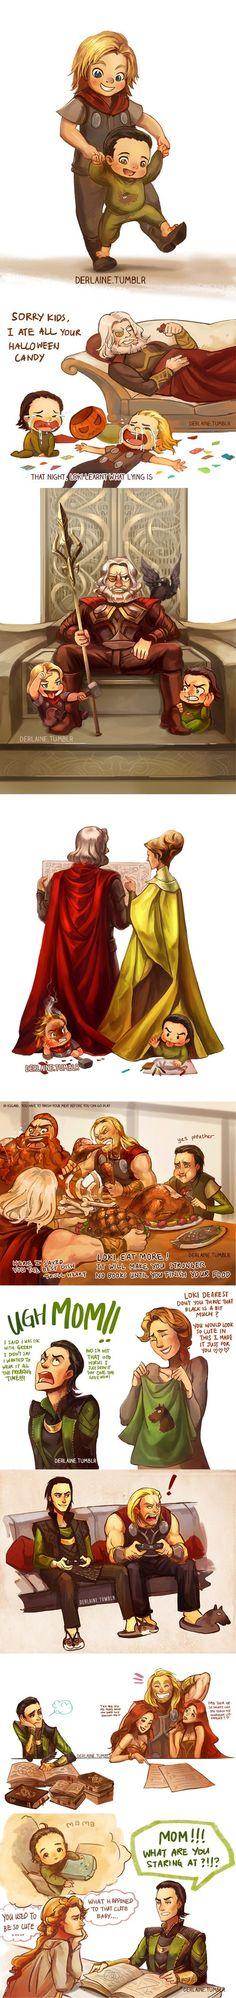 Loki and Thor as babies